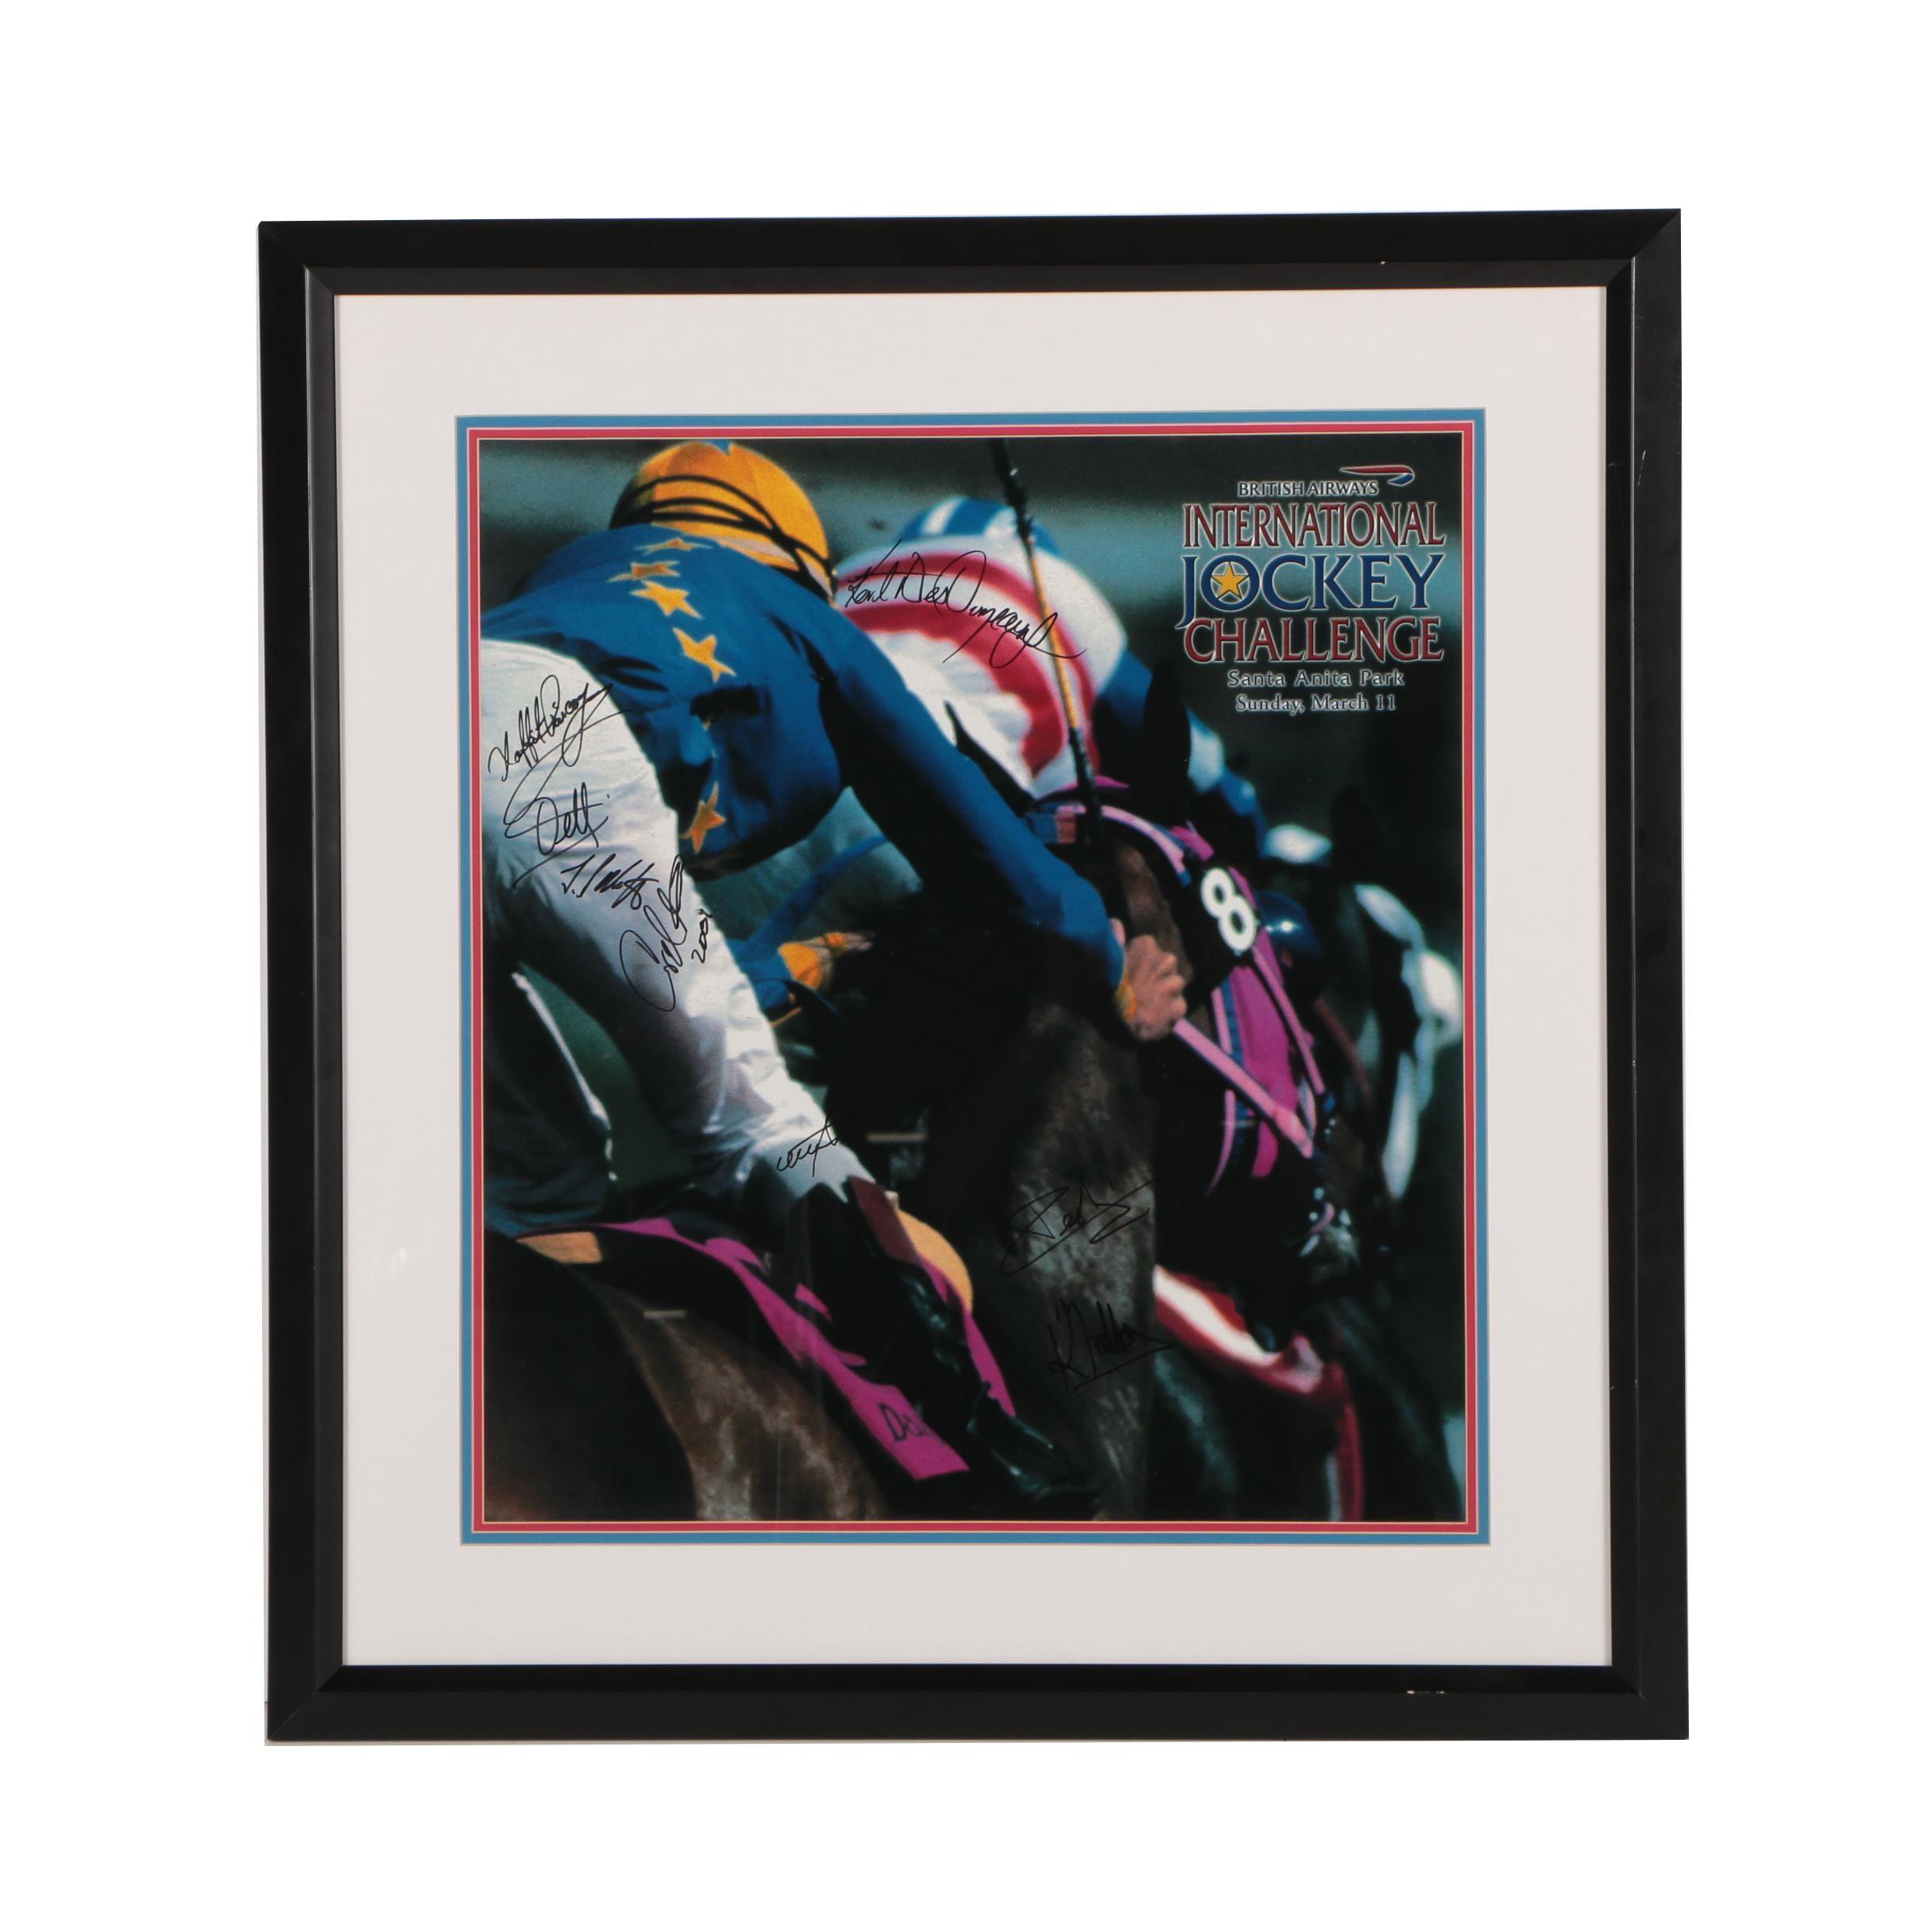 Autographed International Jockey Challenge Poster